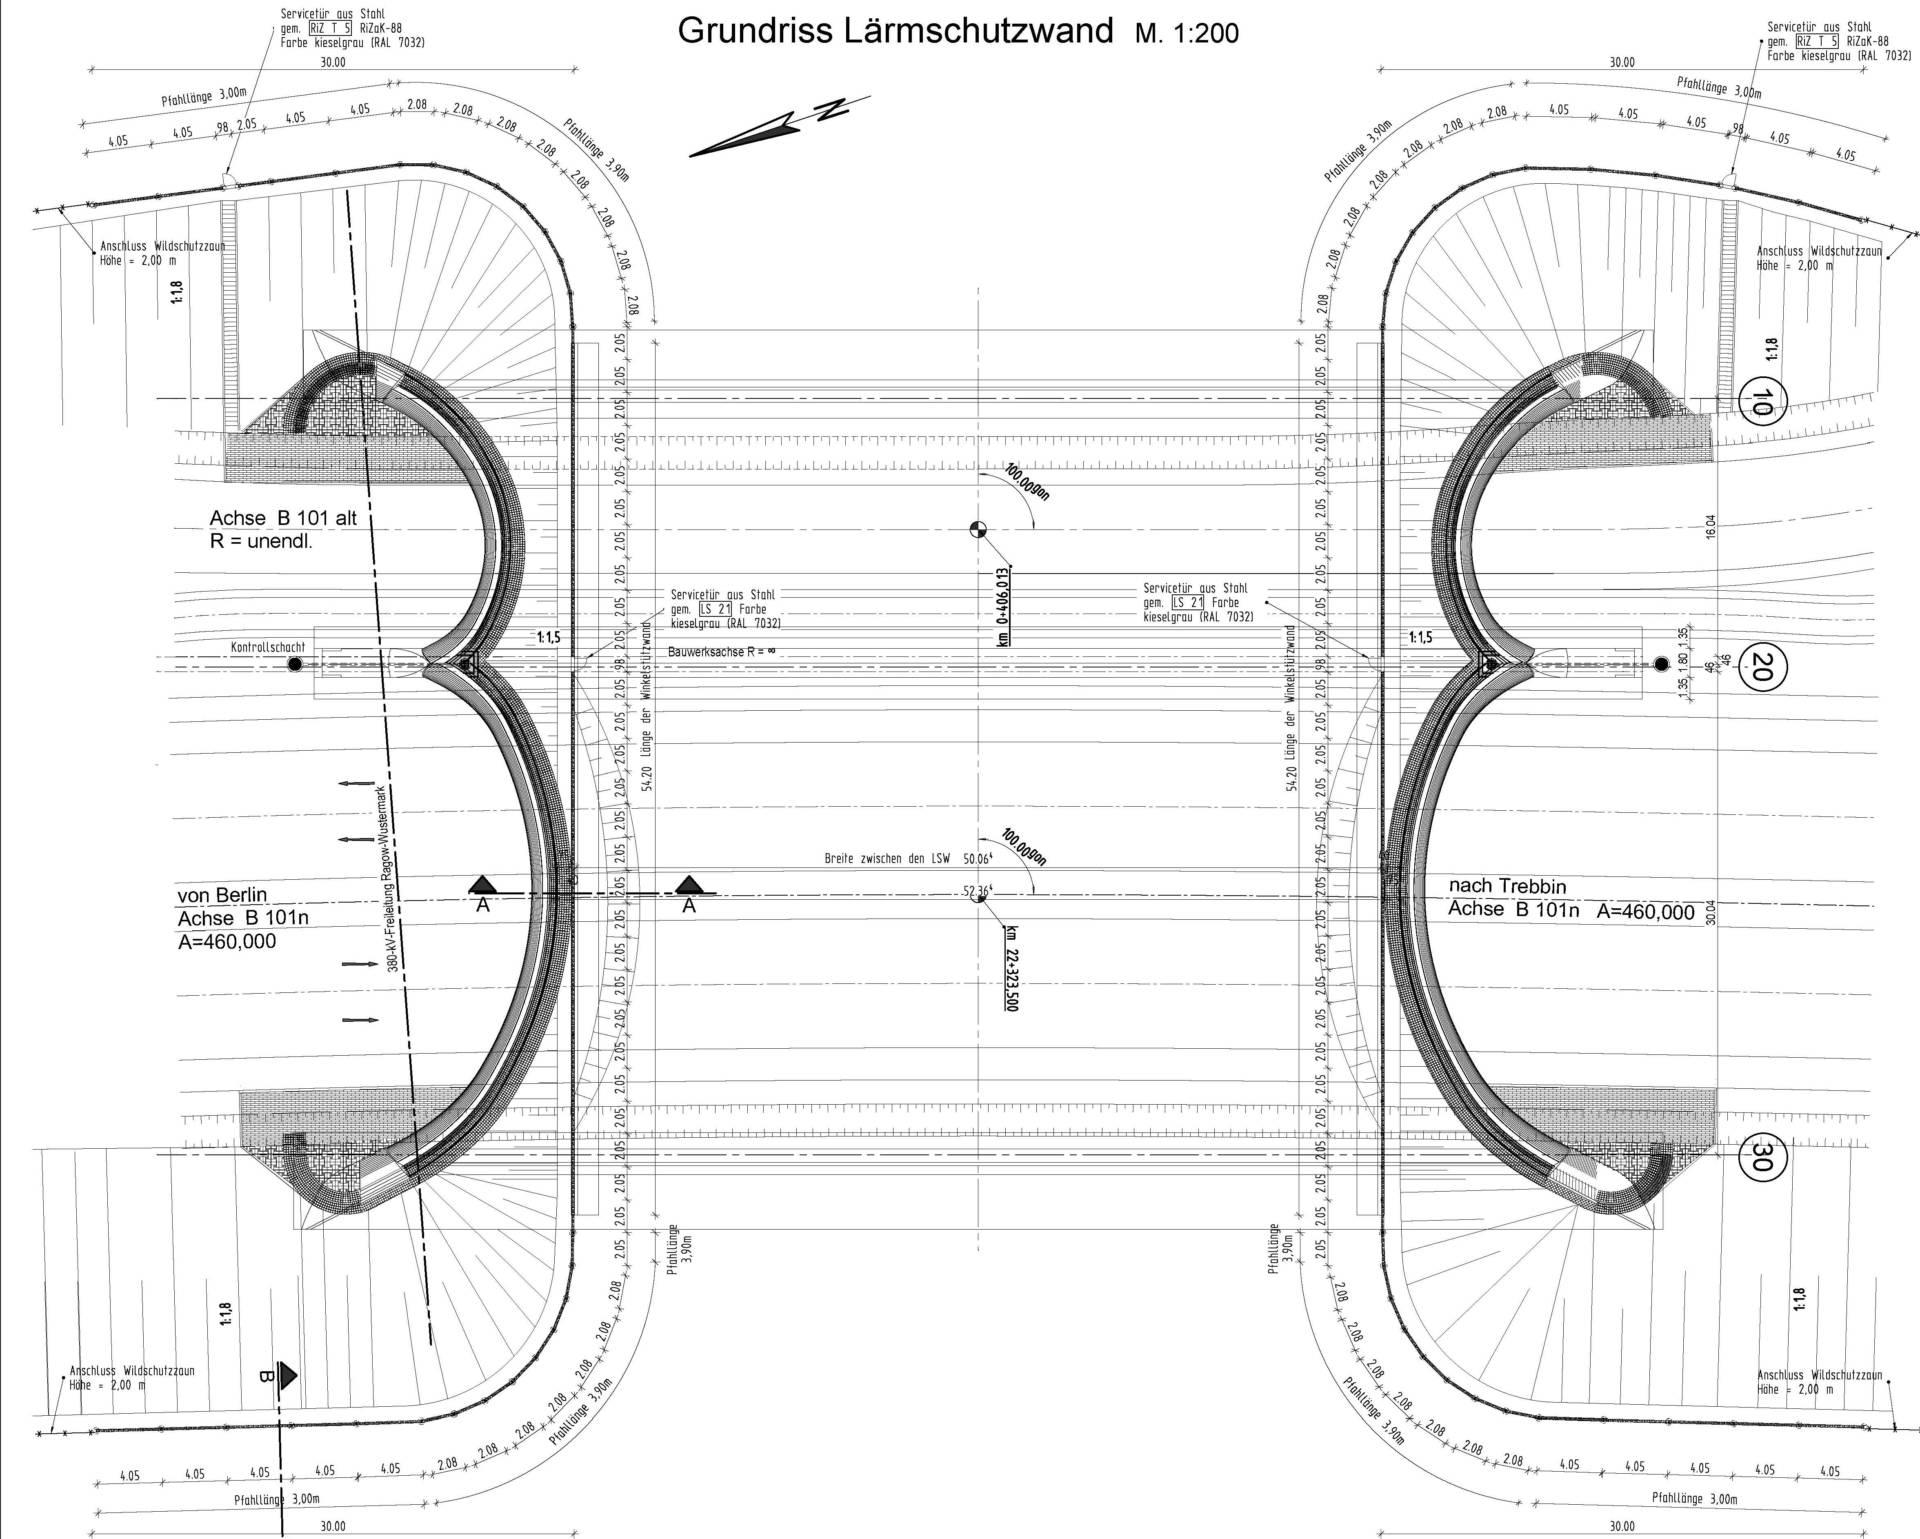 VKE 1133 BW 05 Entwurf ISW 2016 06s3